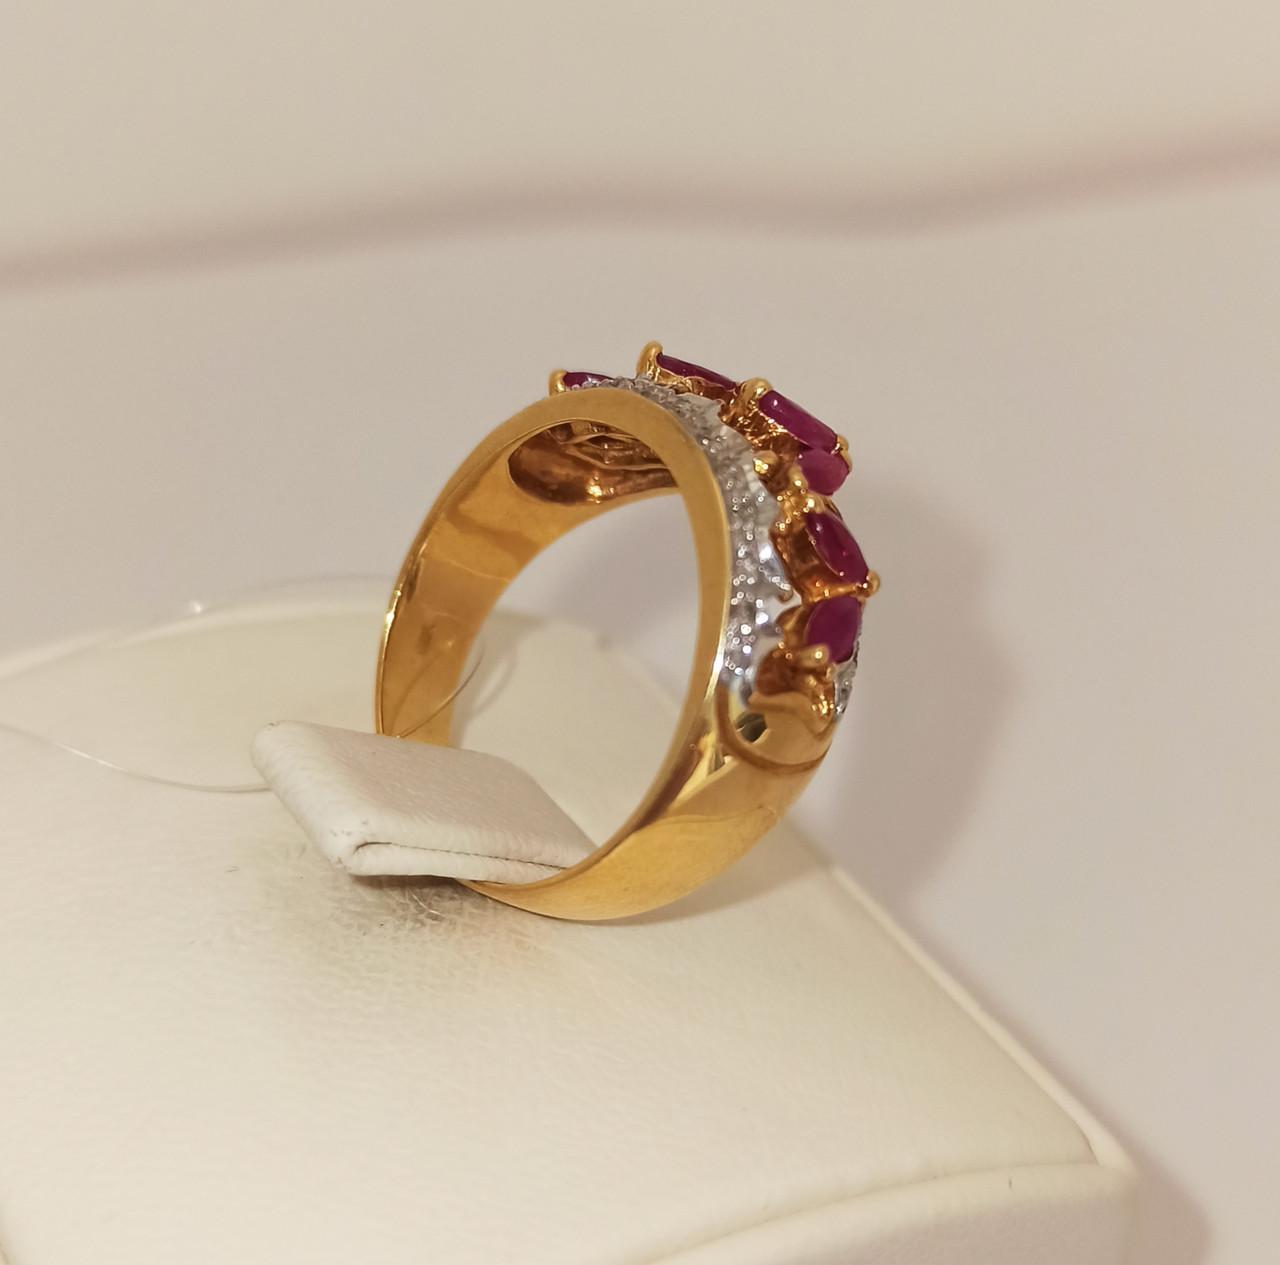 Золотой комплект с бриллиантами и рубинами - фото 4